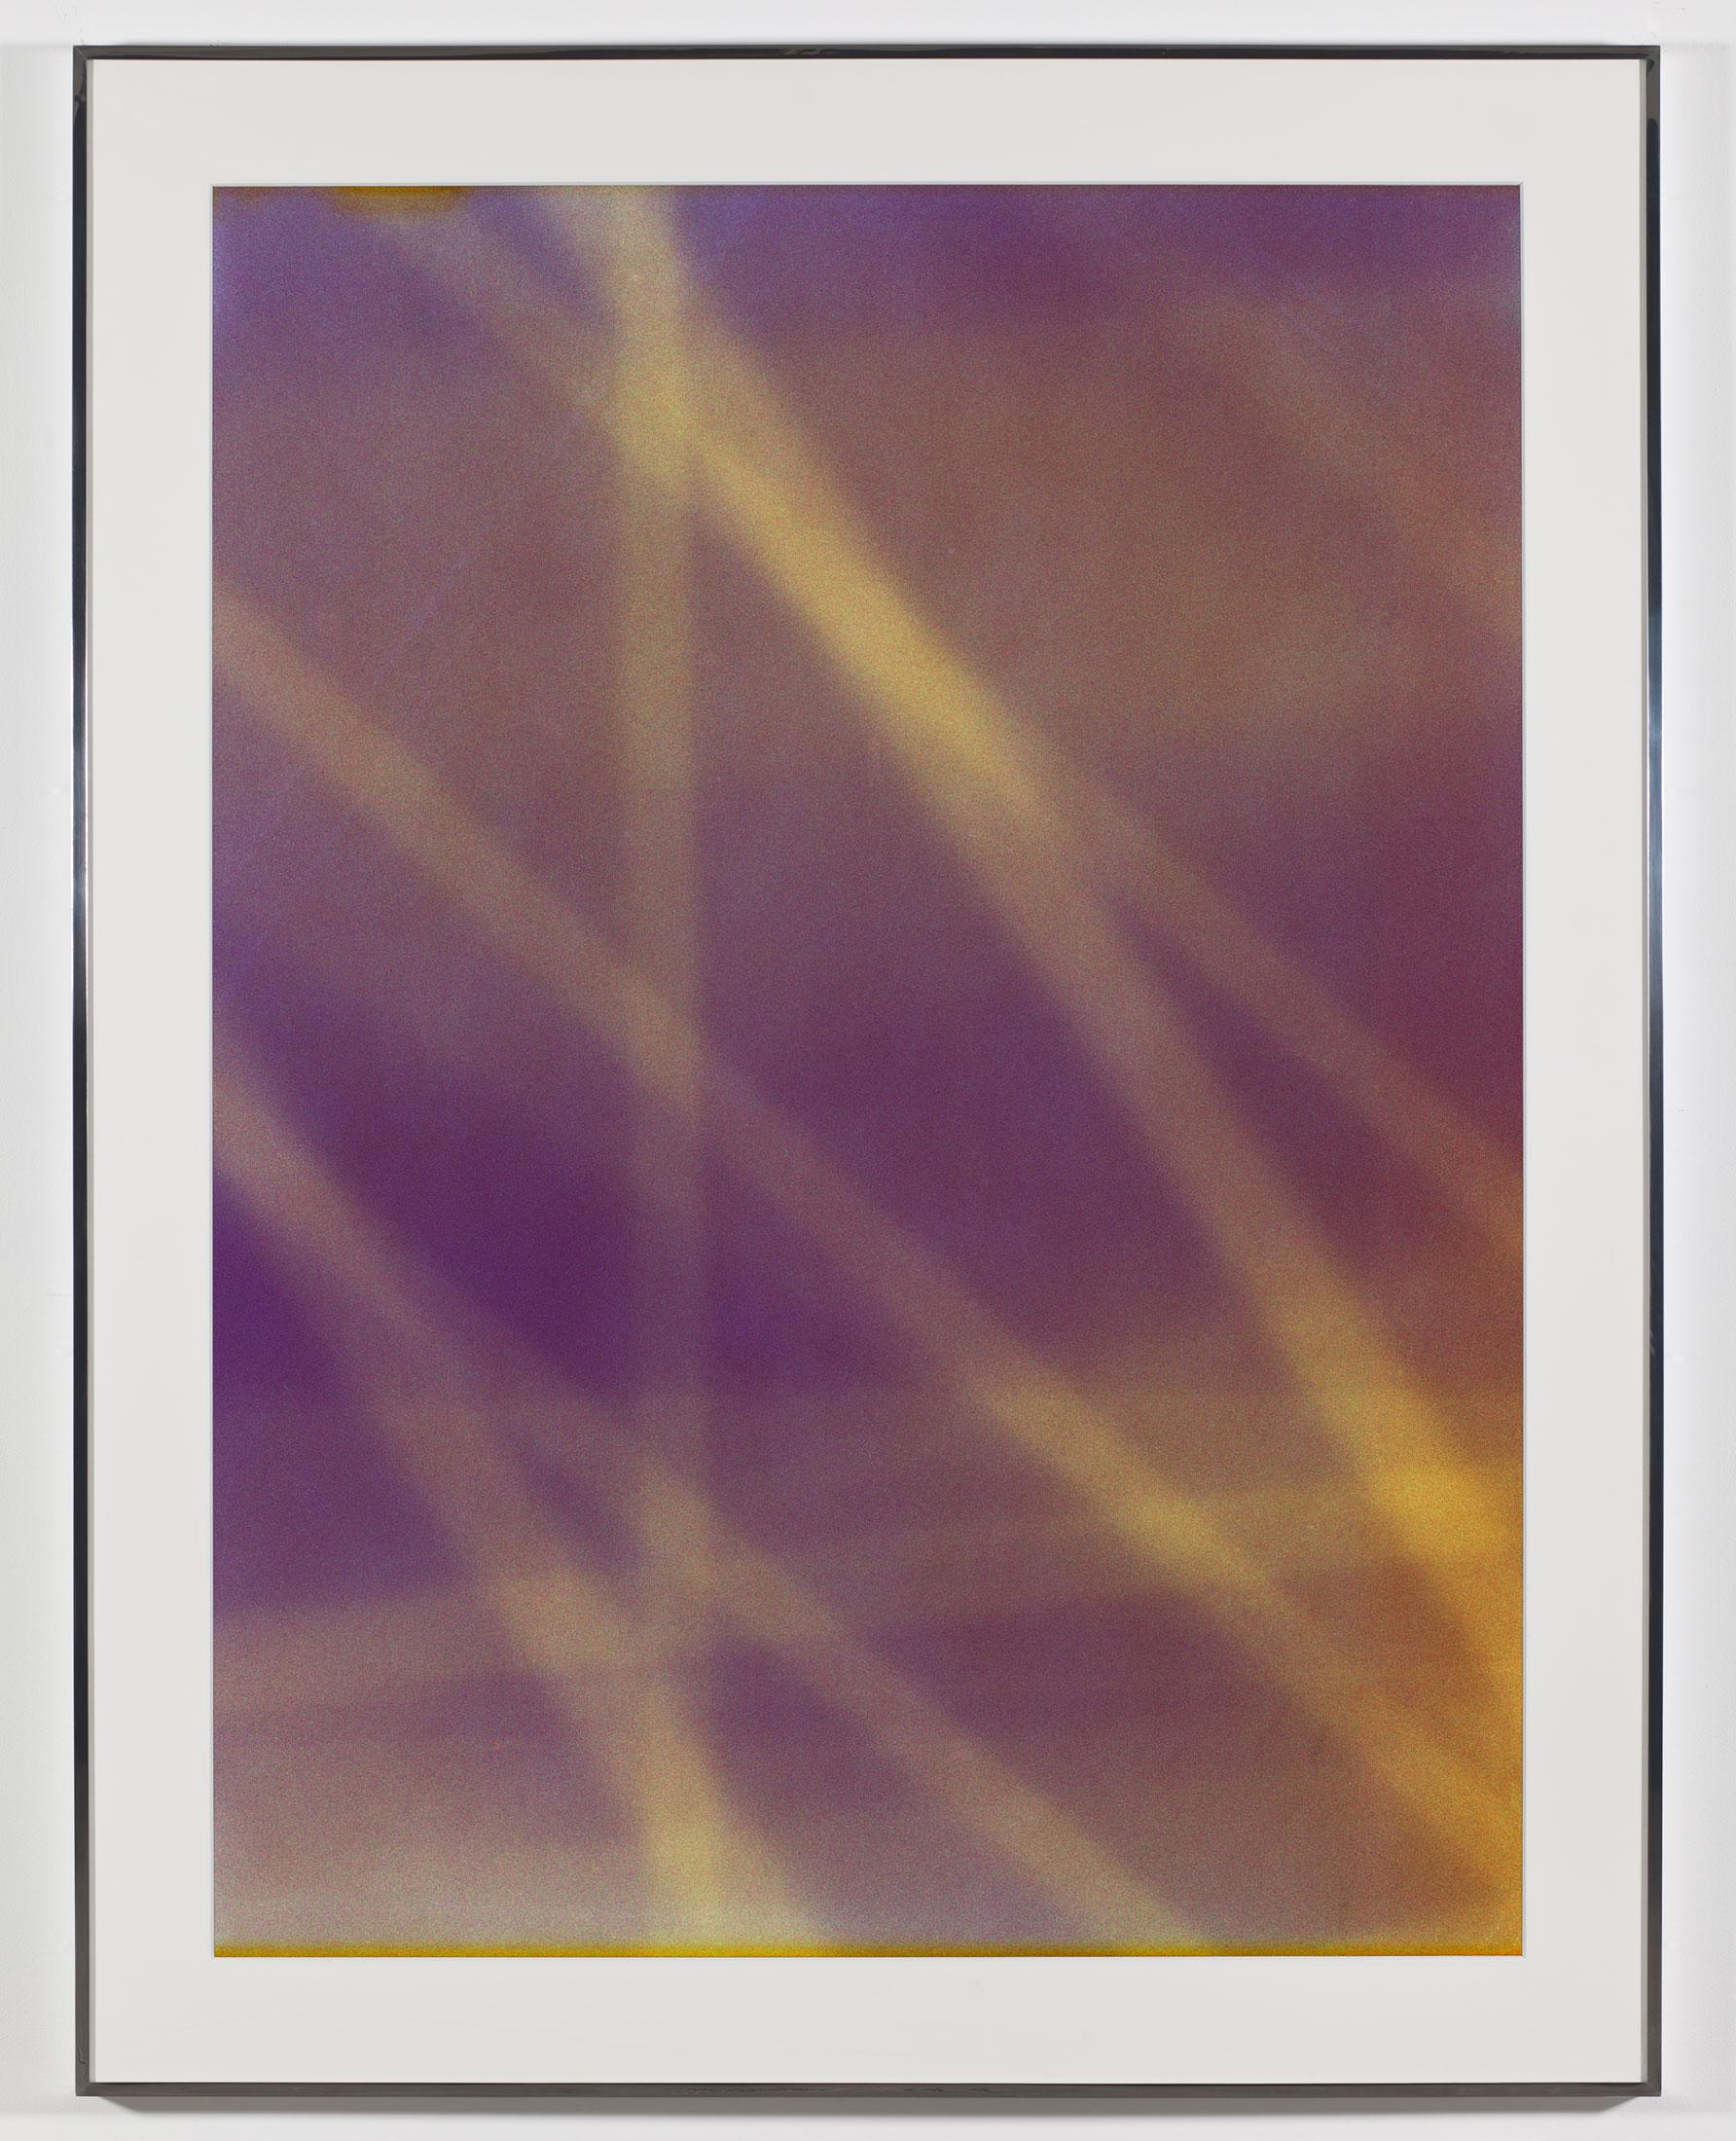 Transparency (Negative) [Kodak Portra 400NC Em. No. 51341: May 8–May 18, 2008 ORD/LHR LHR/IAD IAD/JFK LGA/DCA DCA/ORD]    2009   Epson Ultrachrome K3 archival ink jet print on Museo Silver Rag Paper  68 x 52 1/4 inches   Altermodern, 2009